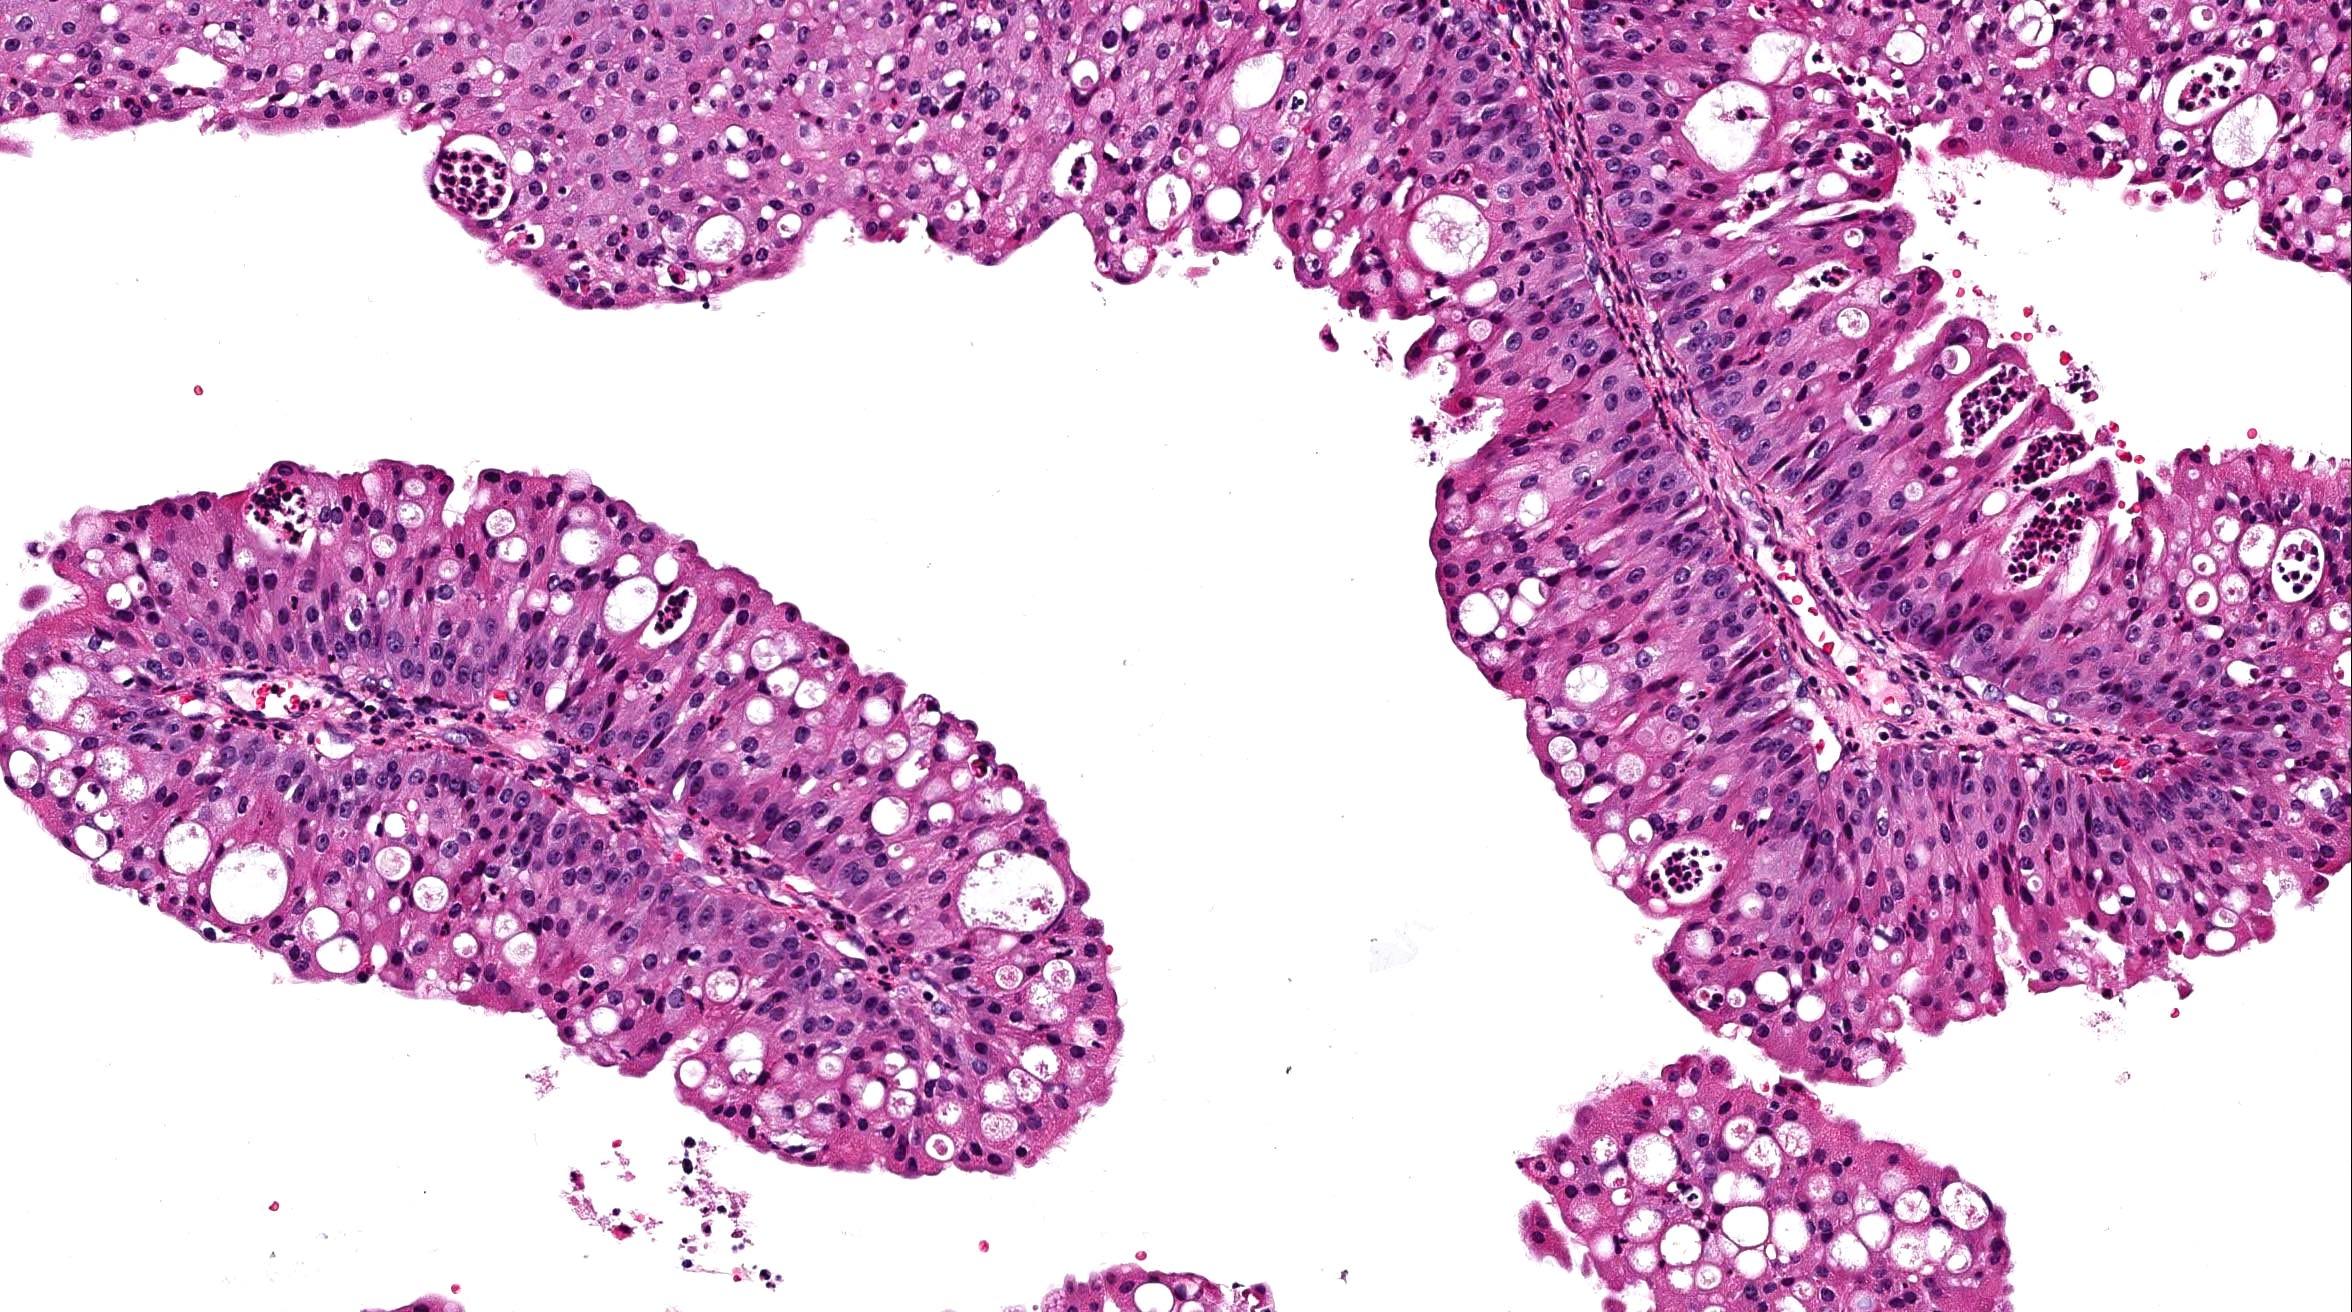 urothelial papilloma hpv